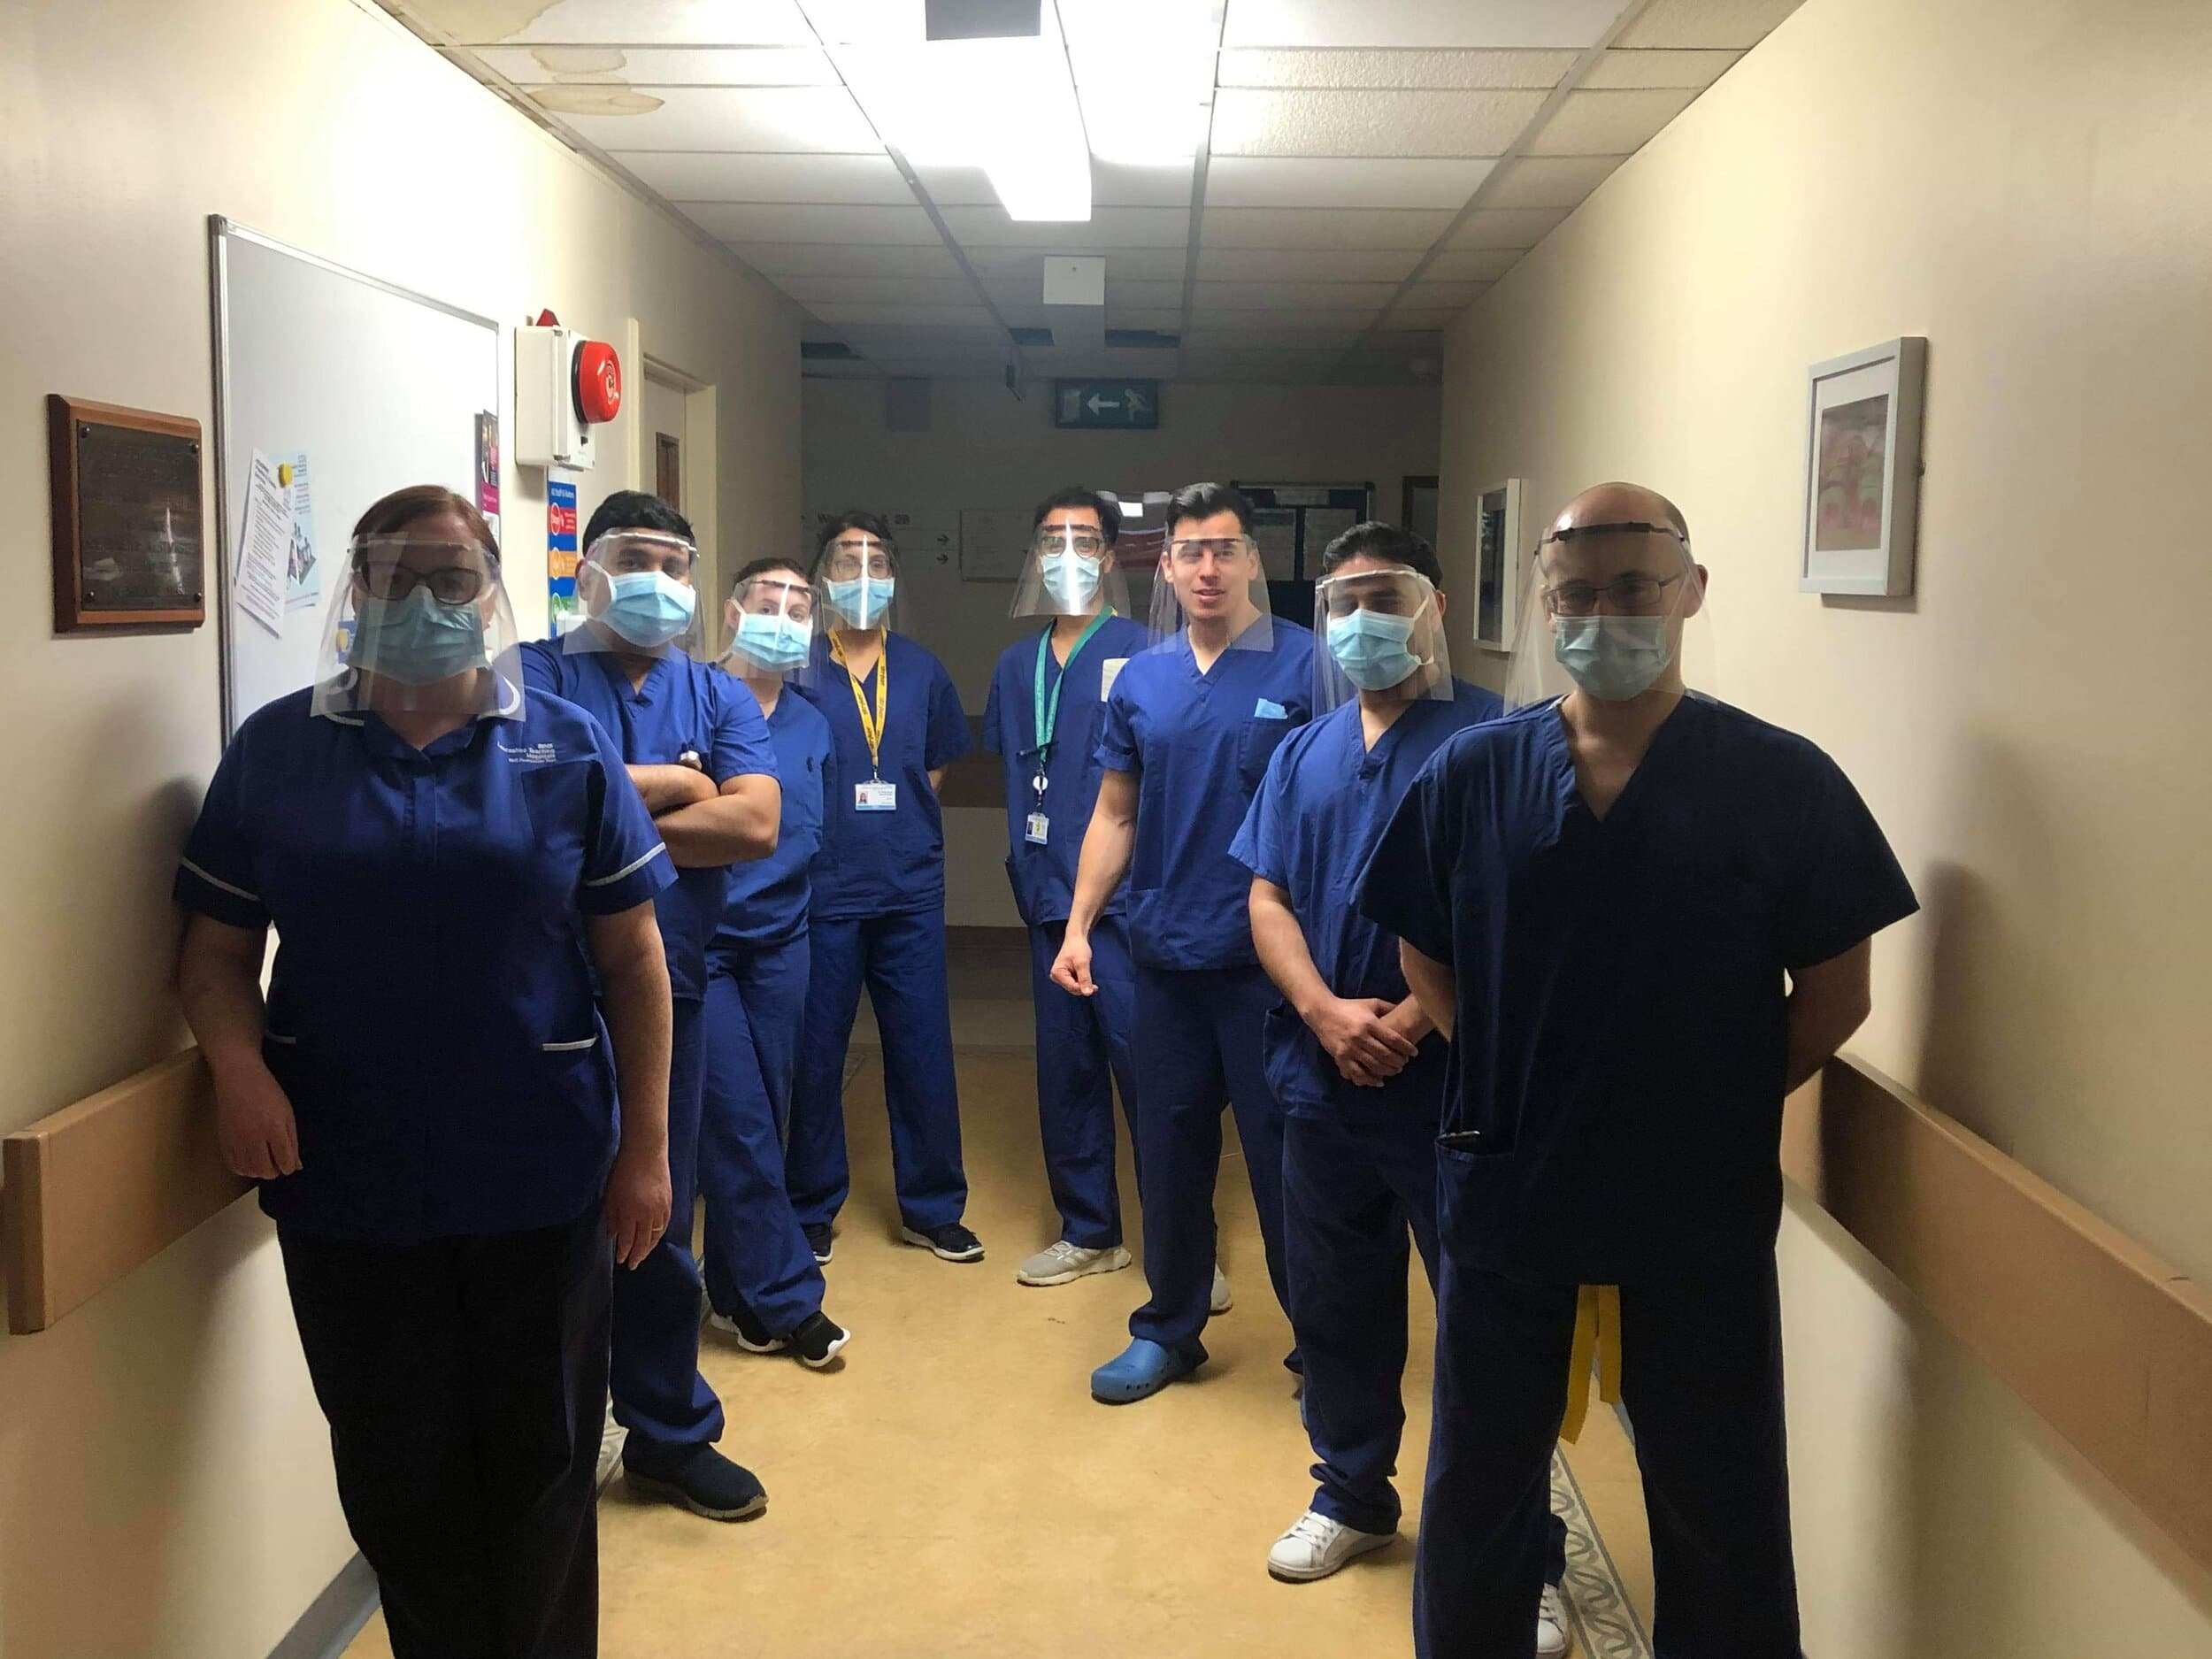 NeurosurgeryteamatRoyalPrestonHospitalwearingChrisJohnsonsPPEMaks